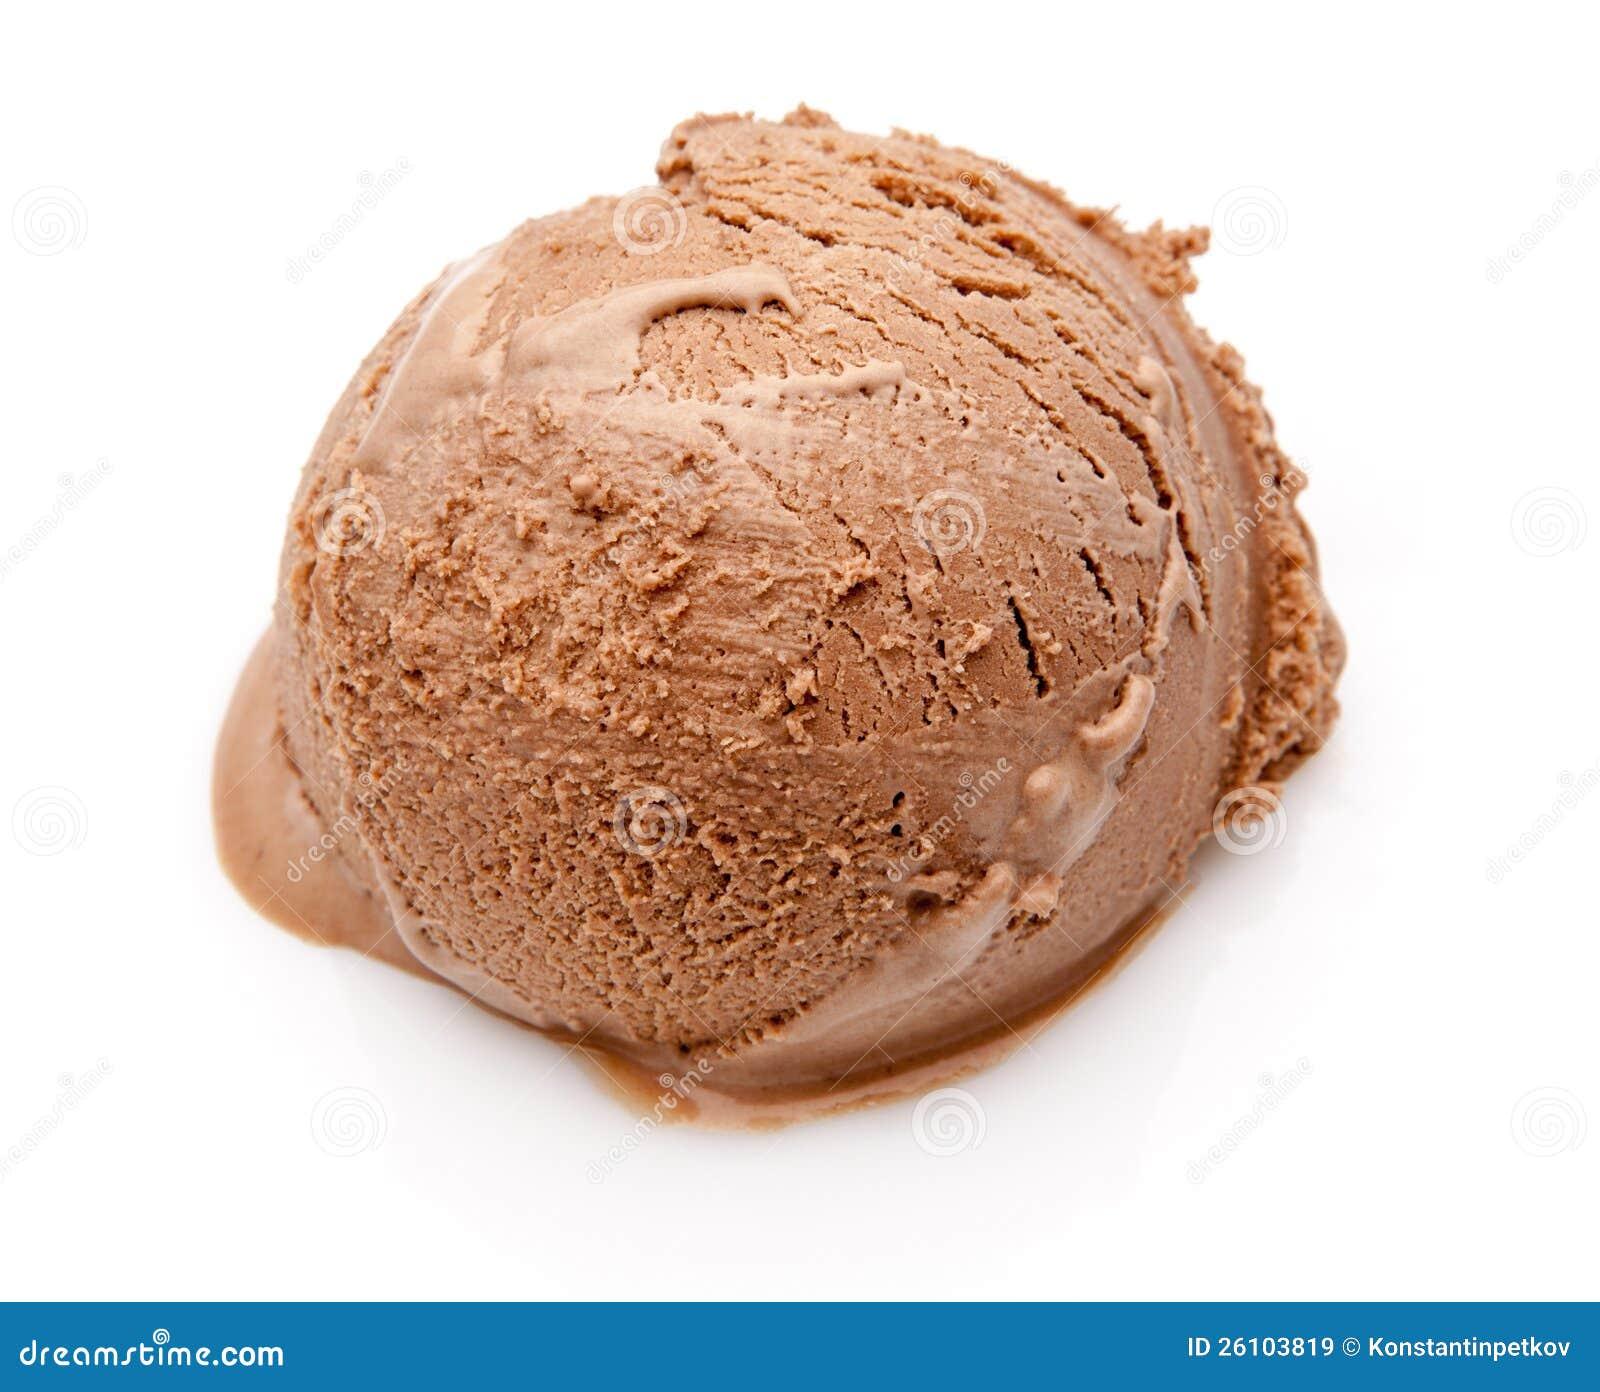 Scoop Ice Cream : Scoop of chocolate ice cream royalty free stock images